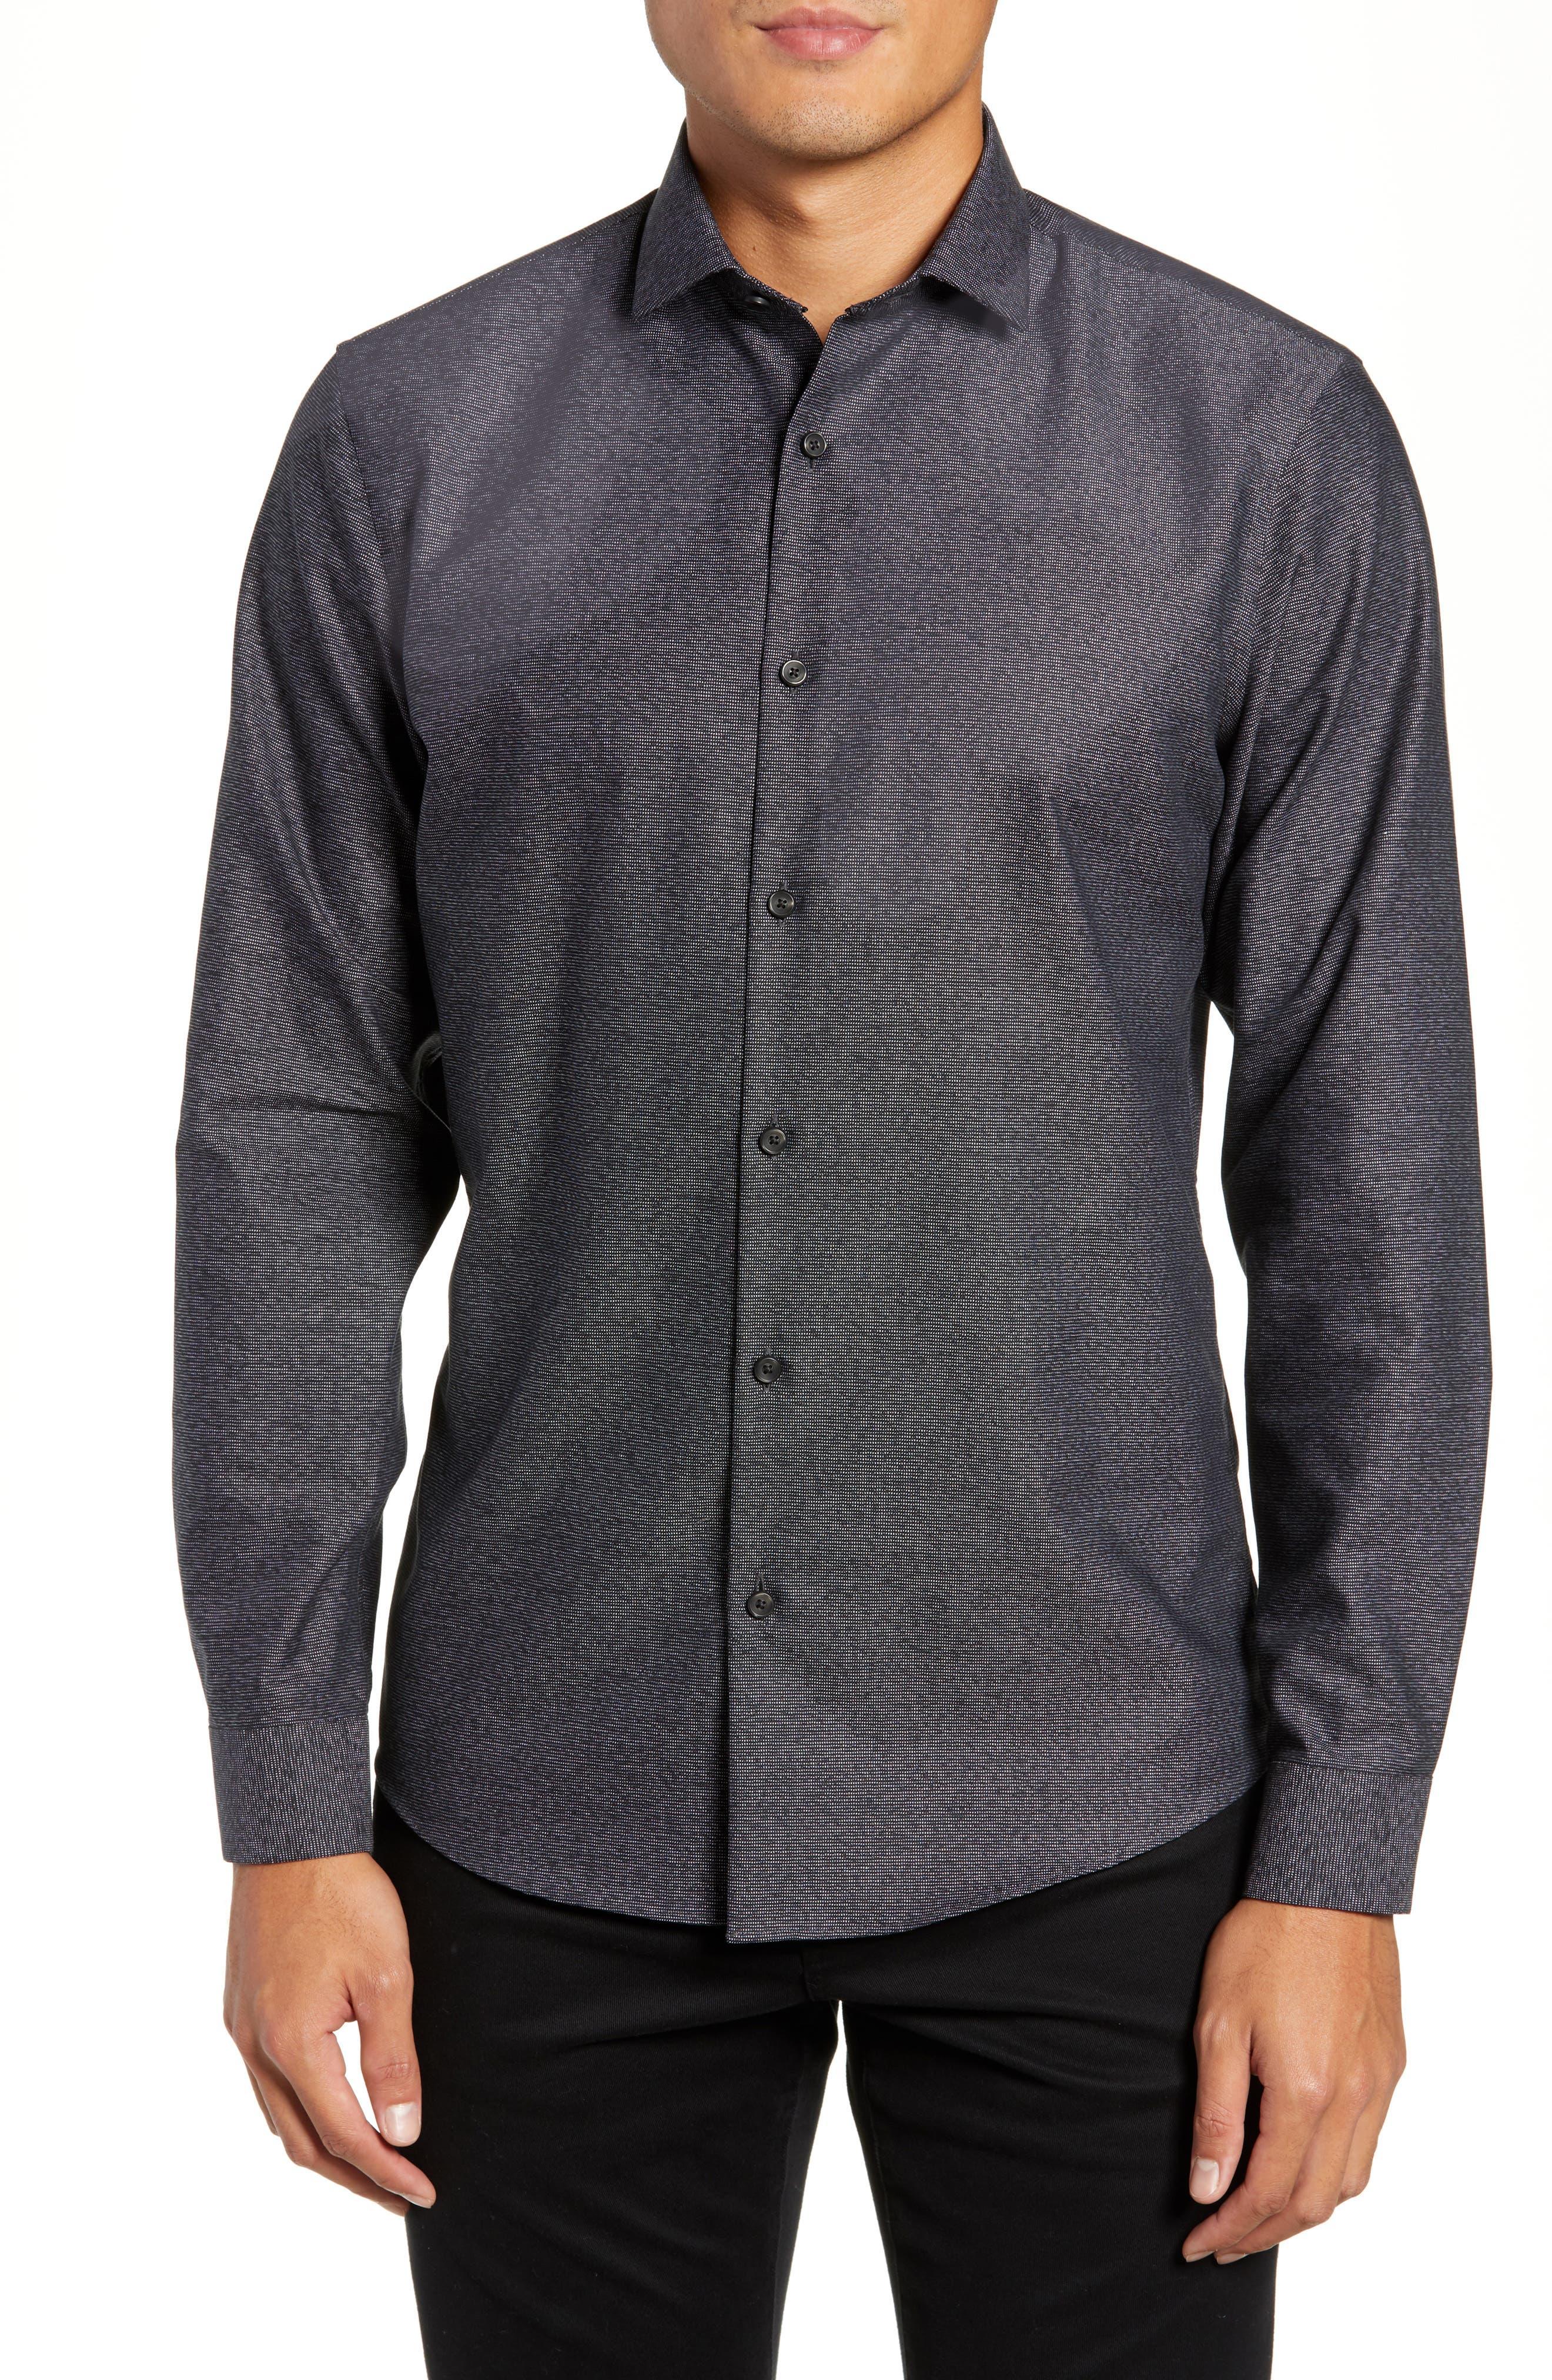 CALIBRATE Slim Fit Non-Iron Textured Sport Shirt, Main, color, 001